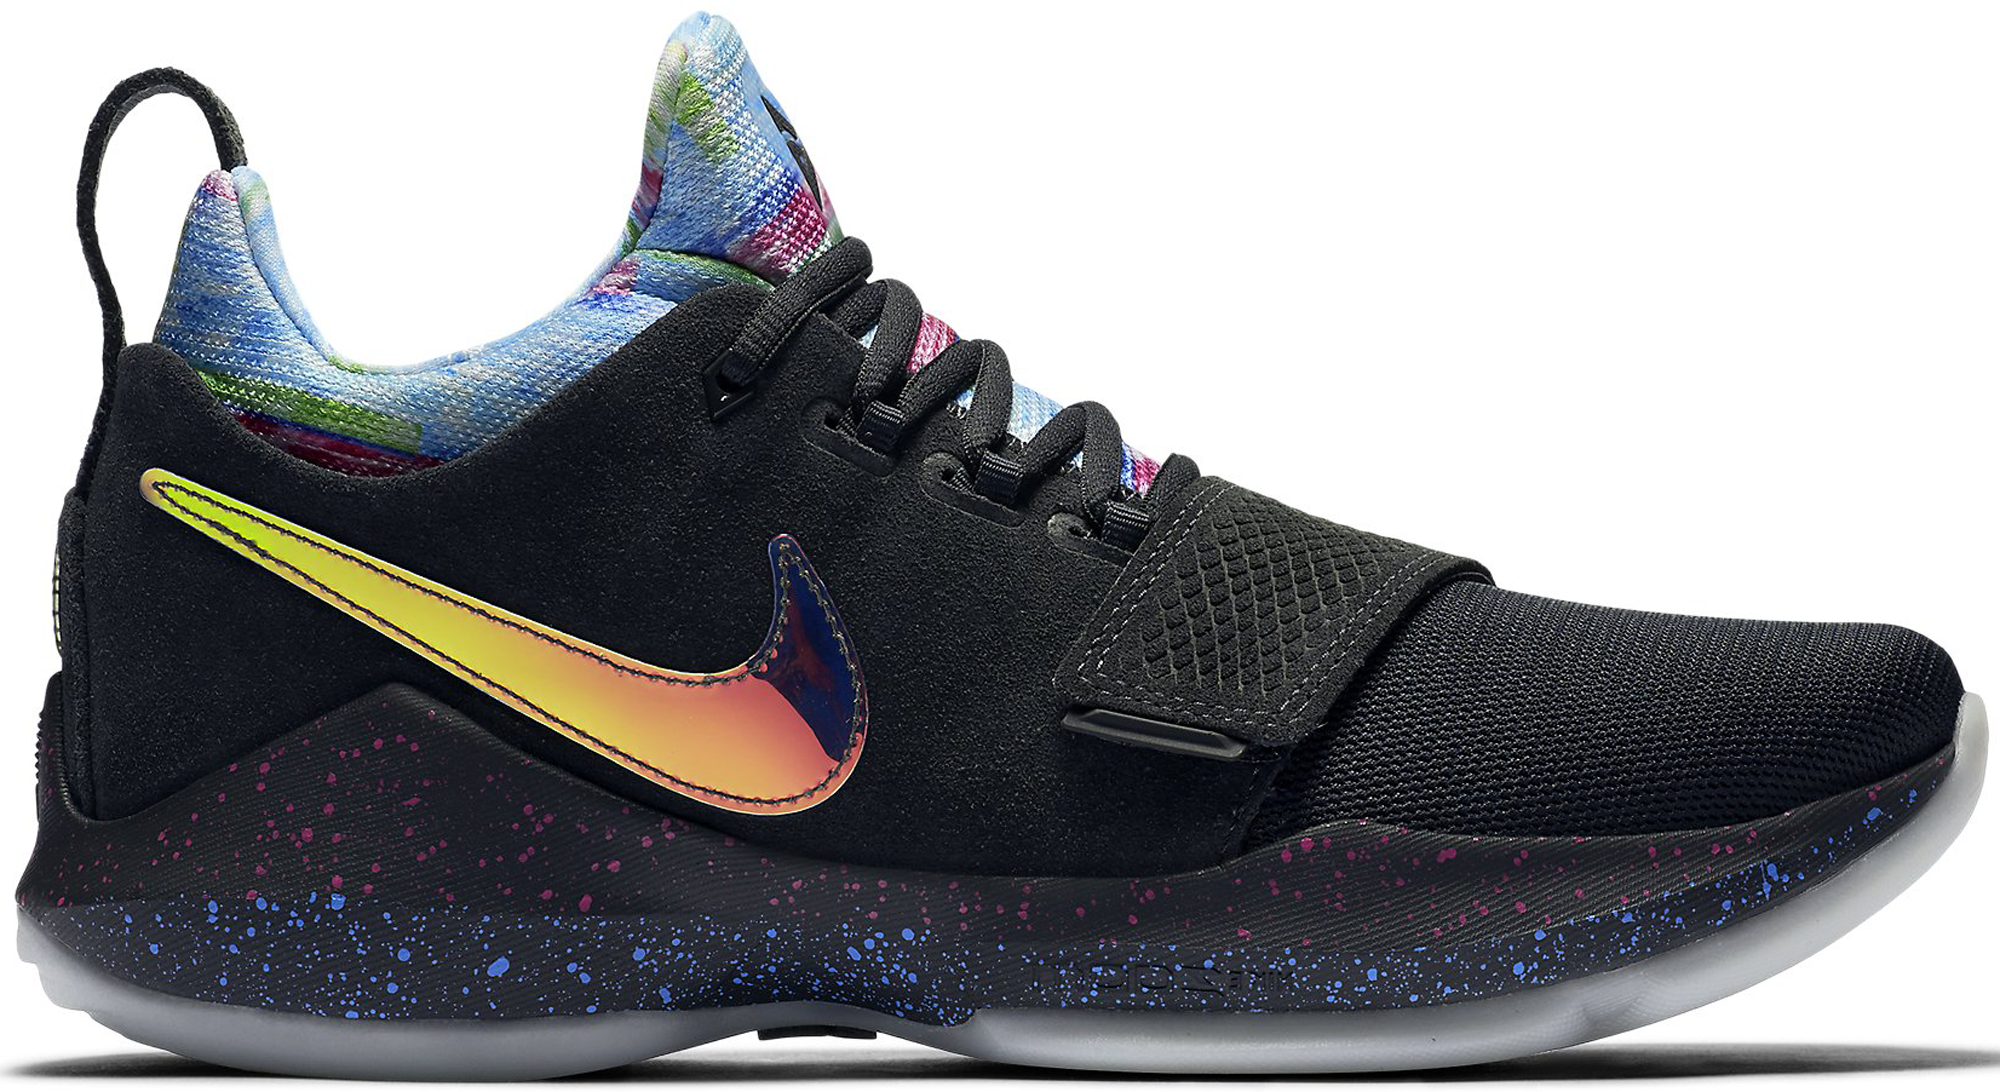 Nike PG 1 EYBL